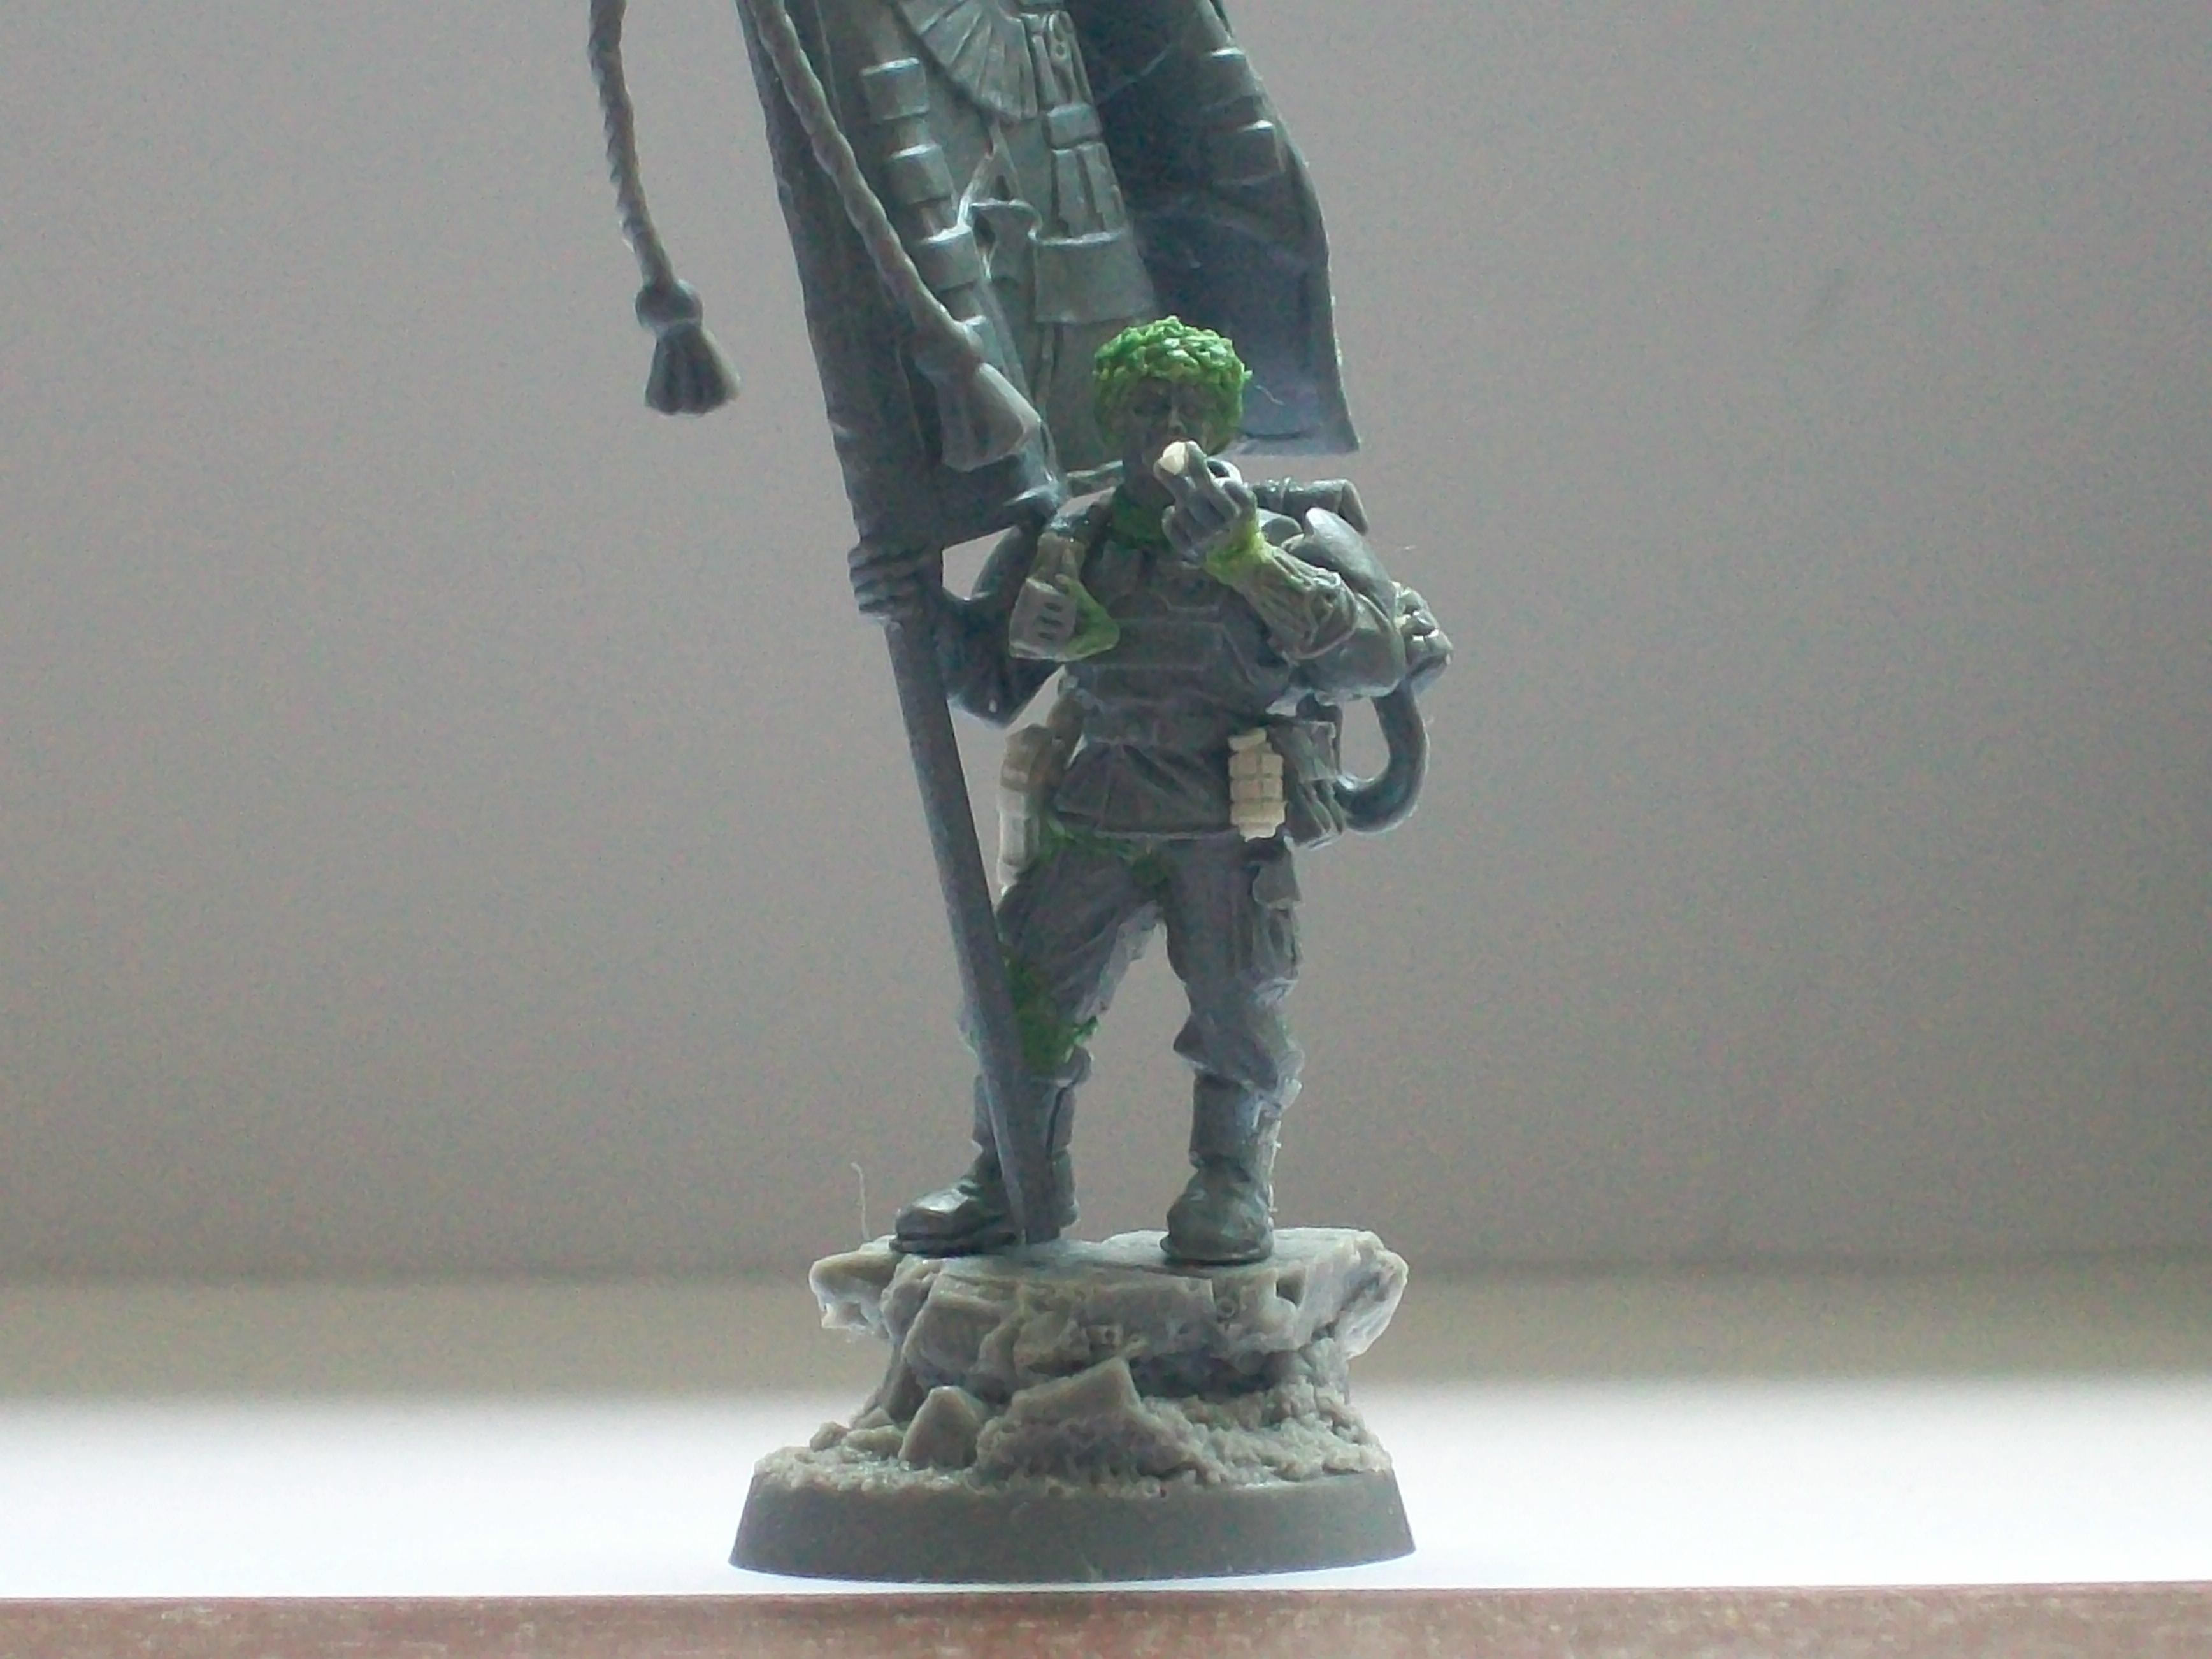 2nd, 2nd Company, Ak, Ak47, Cadians, Get To The Chopper, Ii, Ii Company, Imperial Guard, Kalash, Kalashnikova, Kalashnikovan